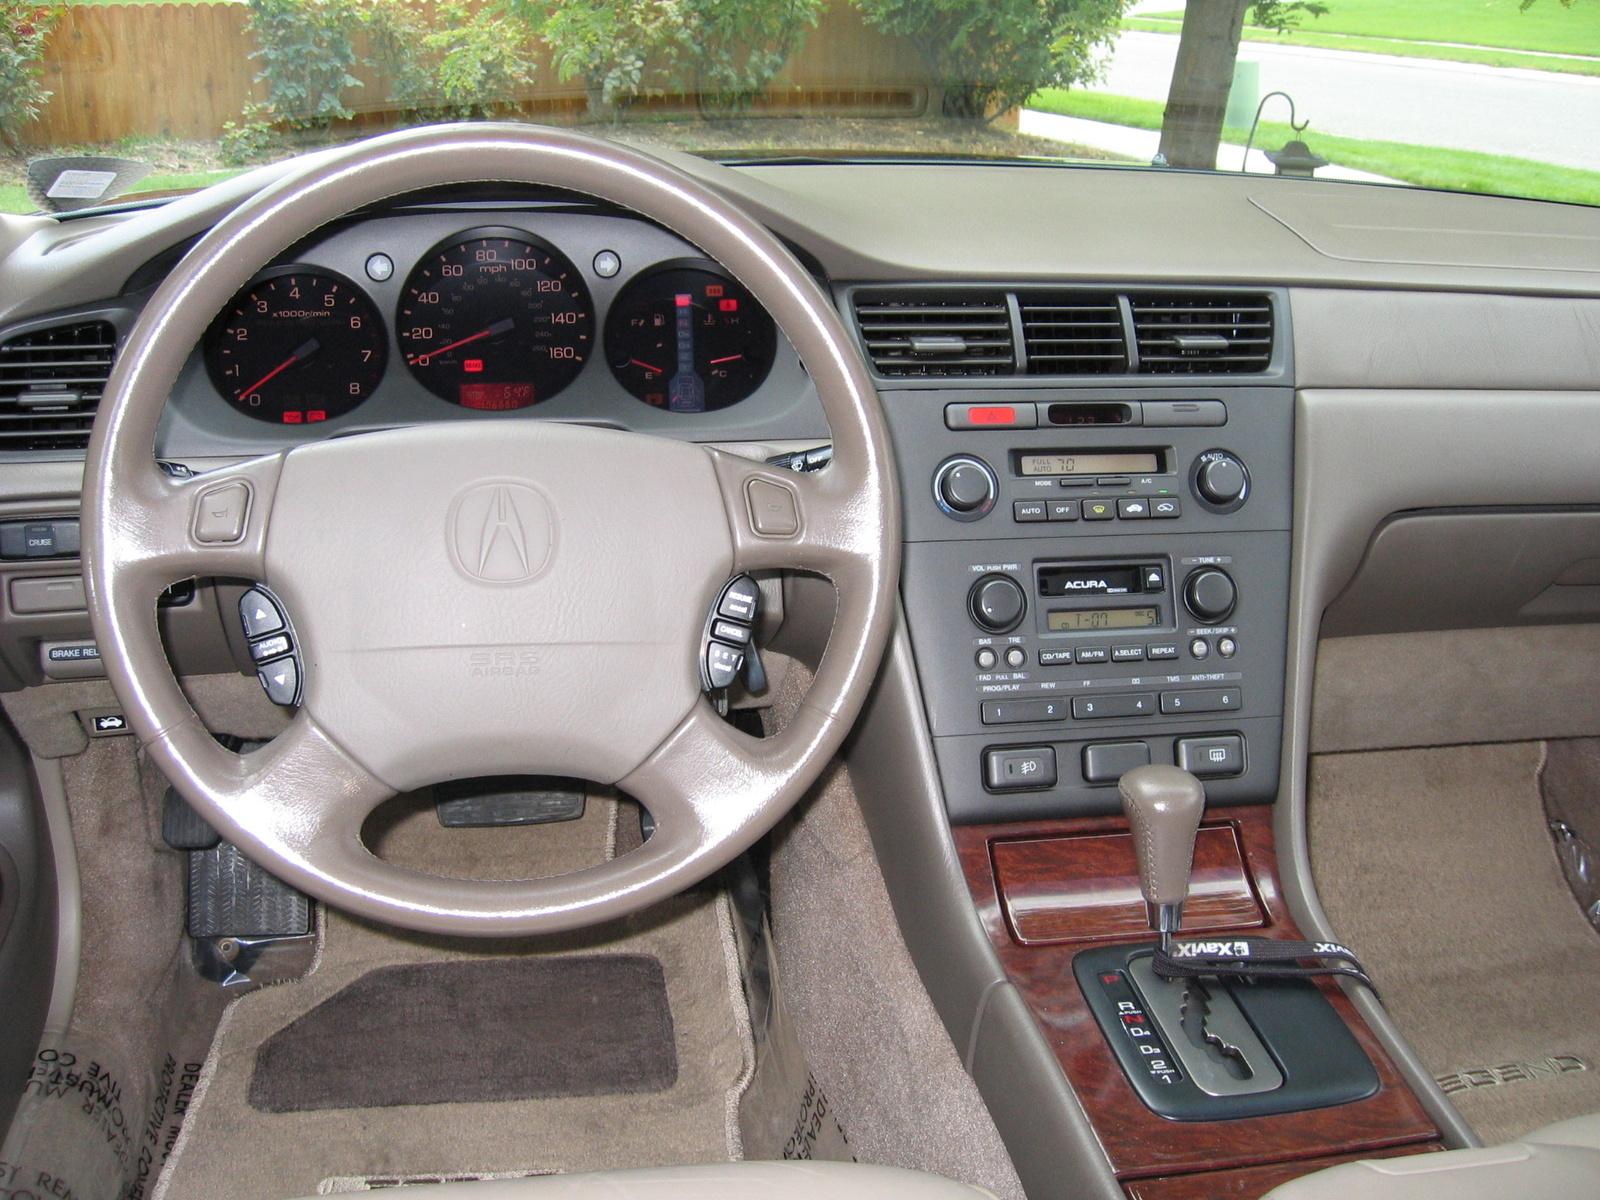 1997 Acura Slx Interior Fuse Box Location 1600x1200